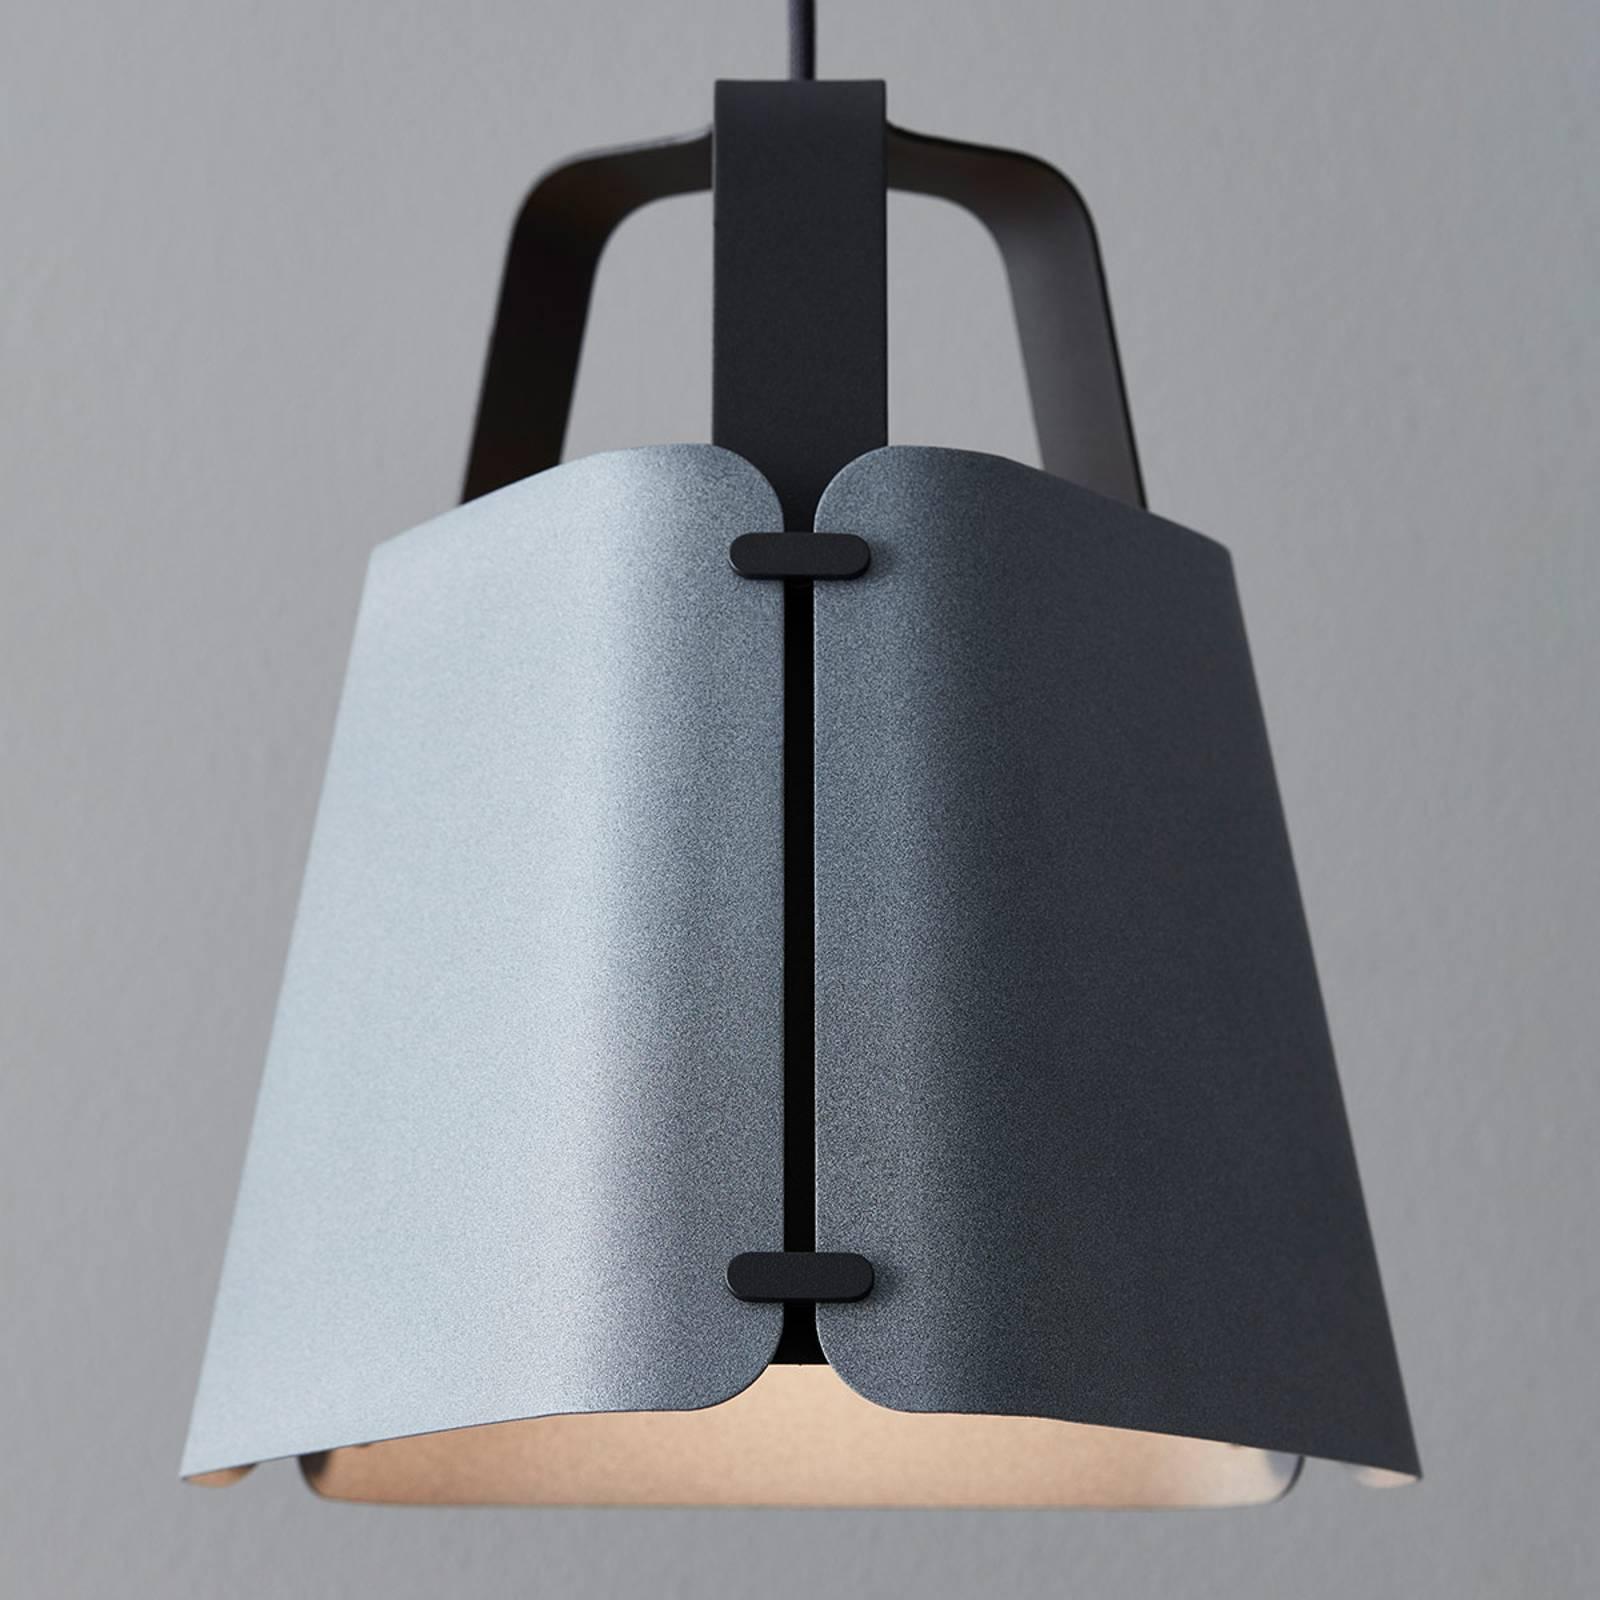 Lampa wisząca Fold, struktura betonu, 33,3 cm